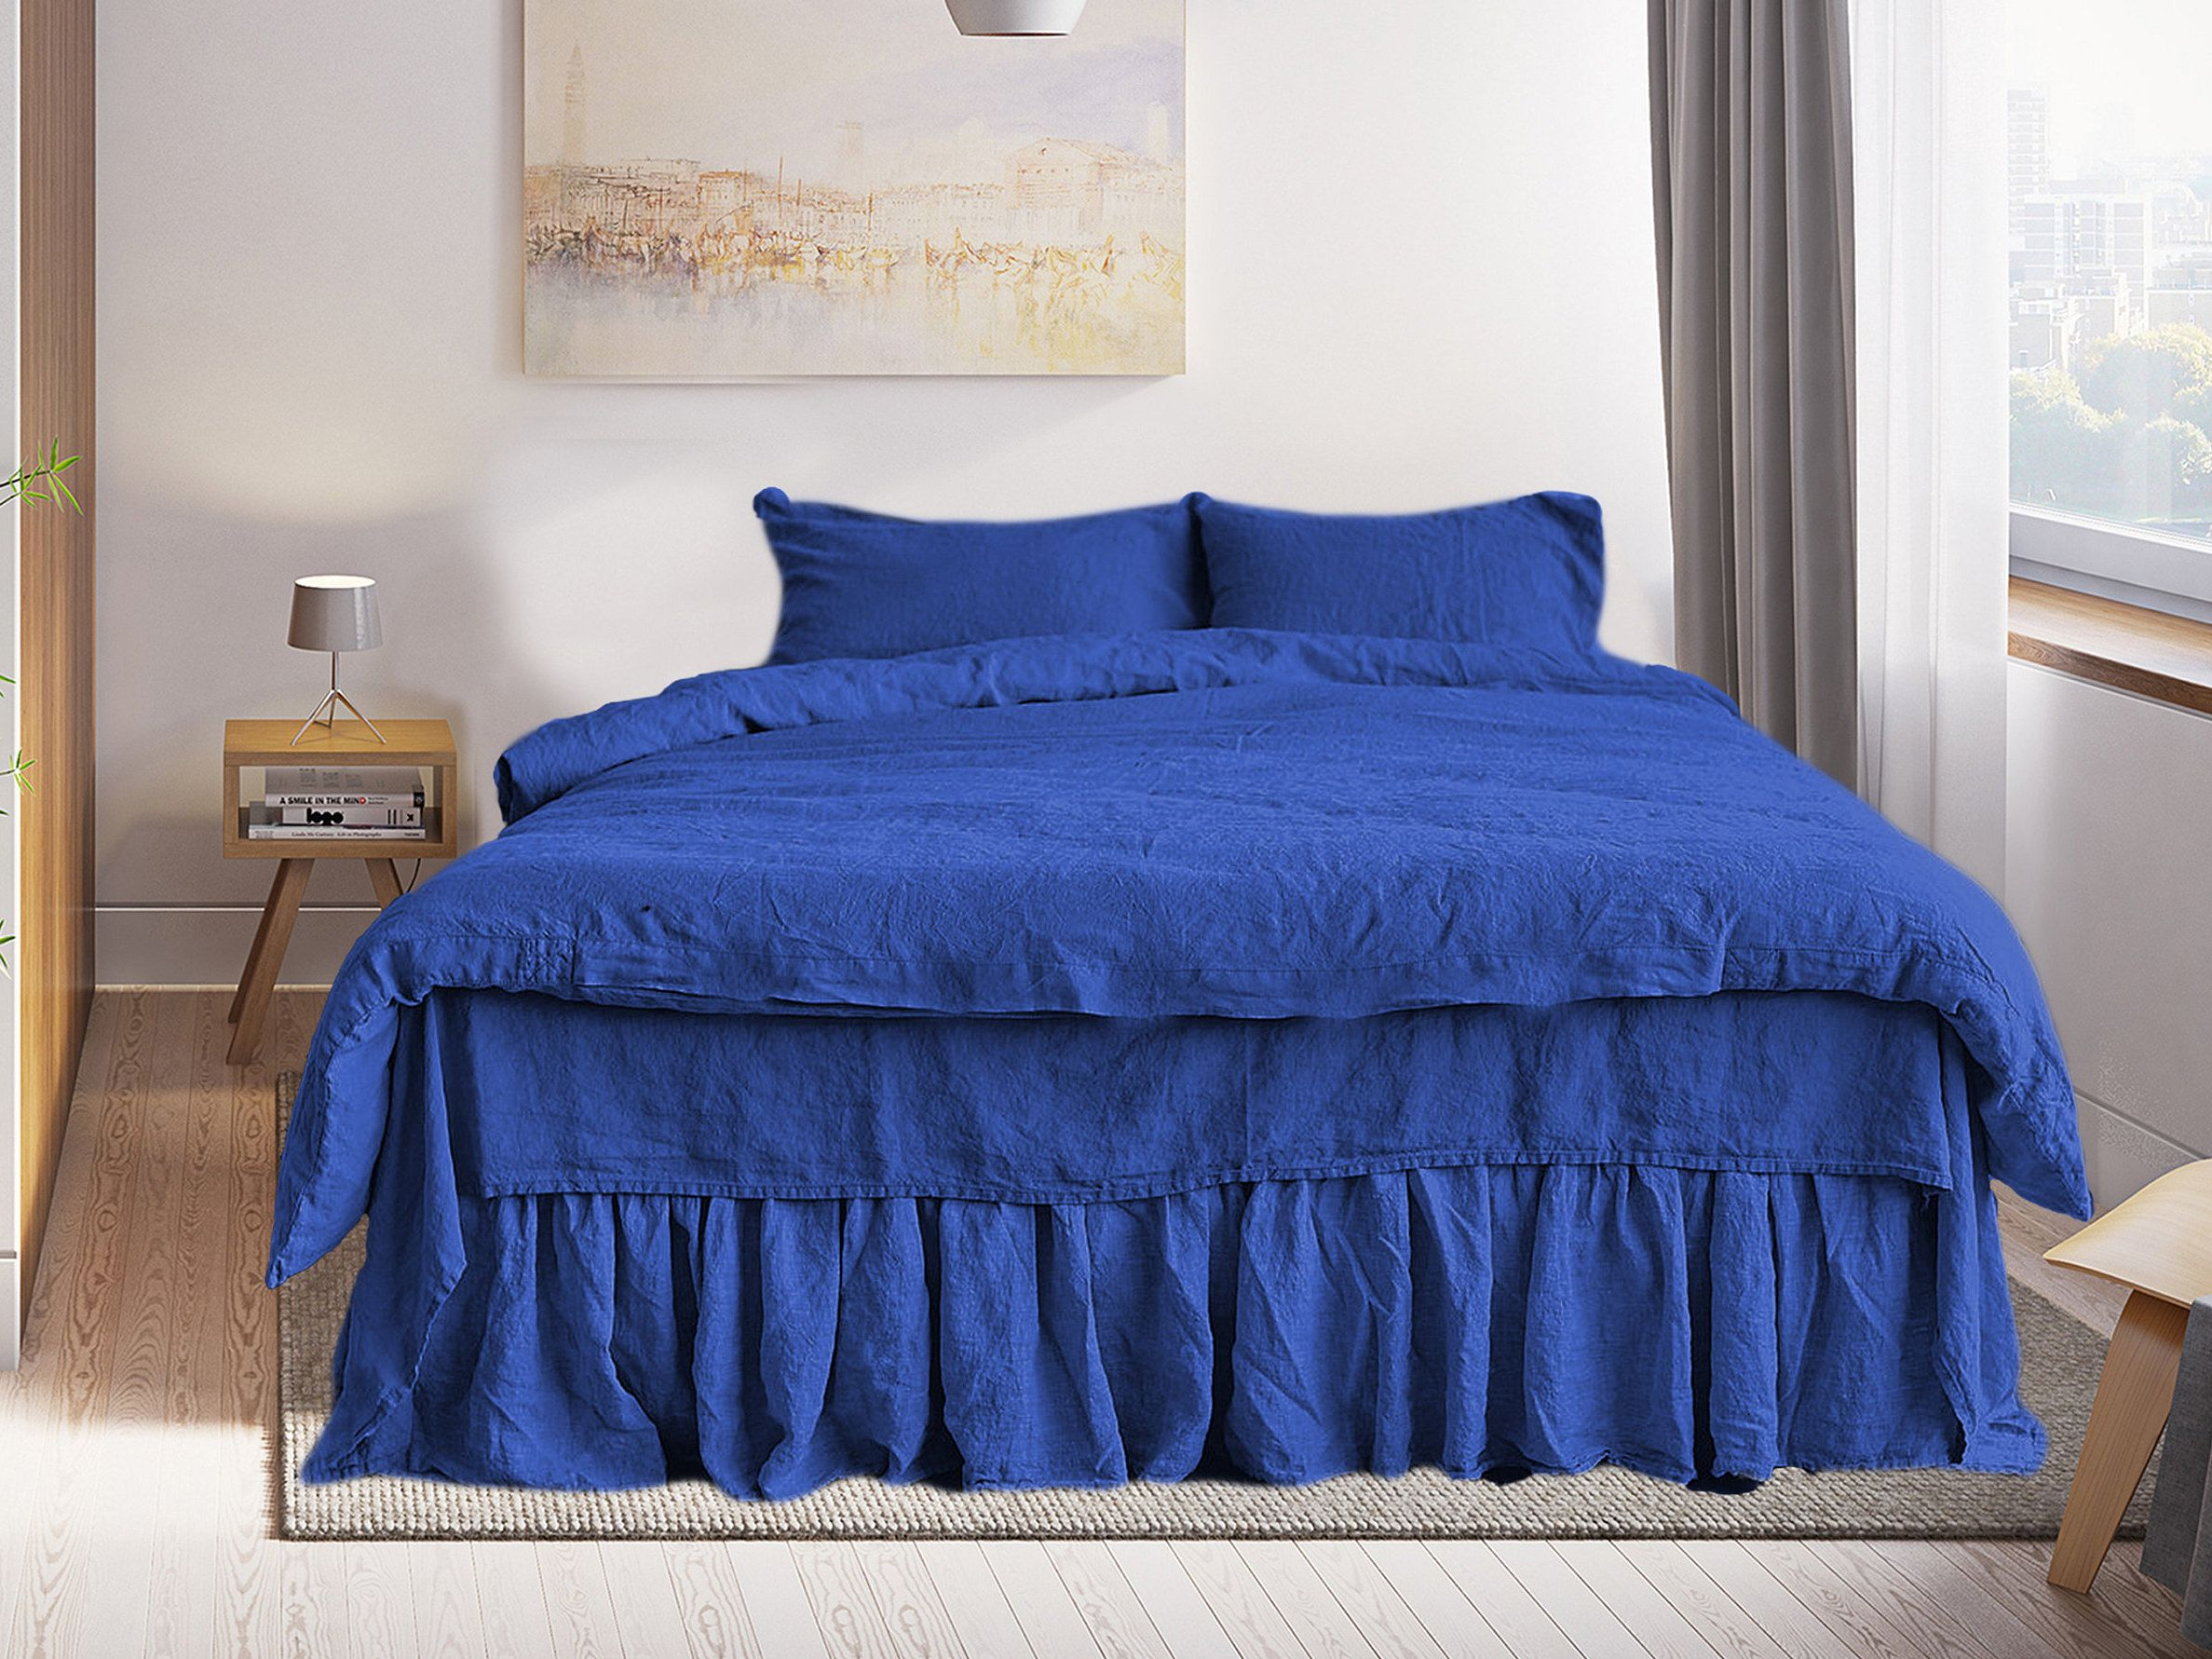 Duvet Cover set 3 items in Royal blue Soft Linen Bedding